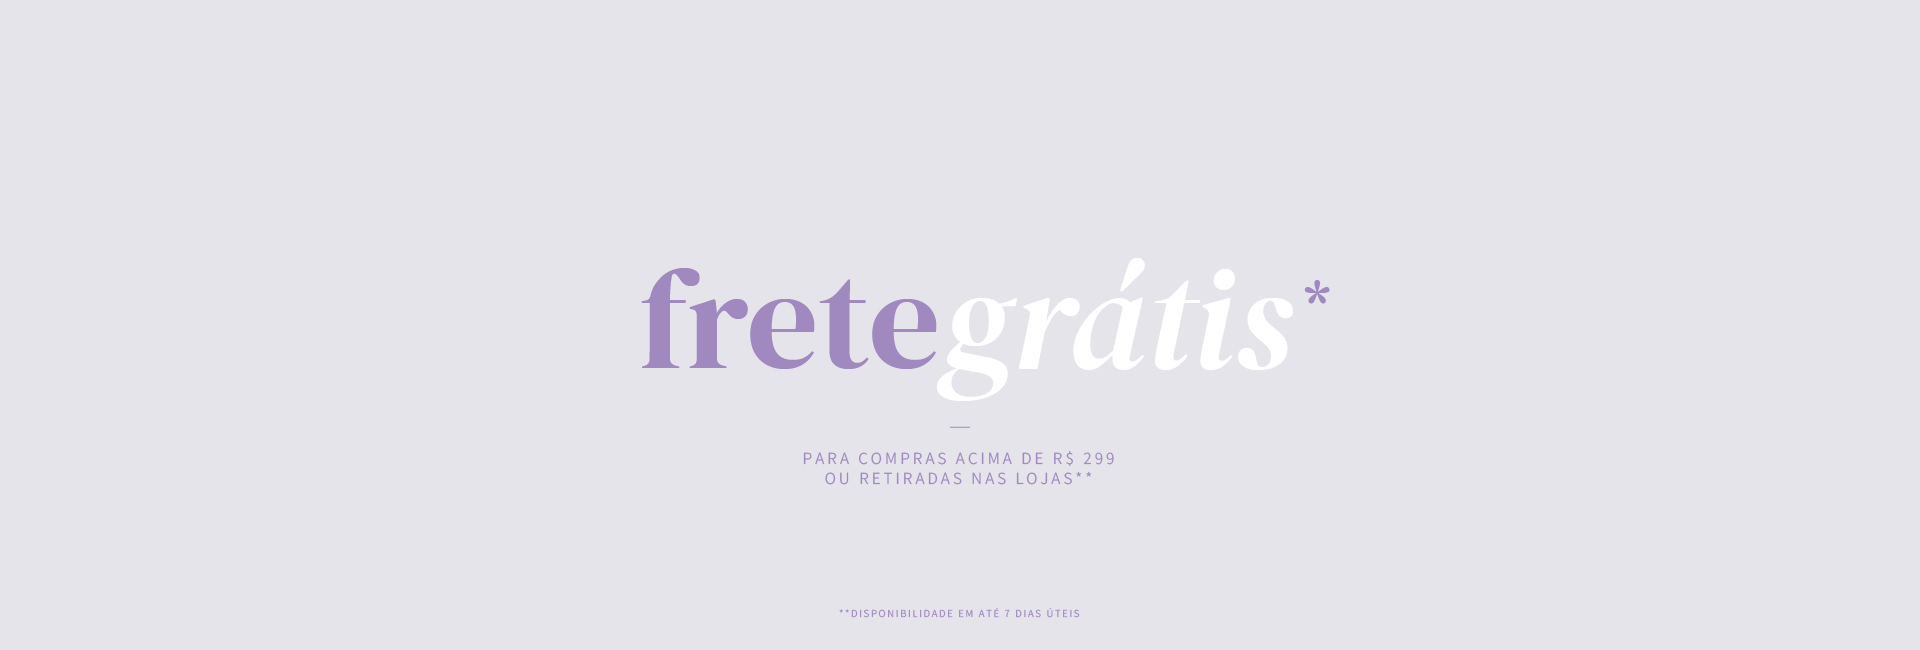 FRETE GRÁTIS CLARIÁ